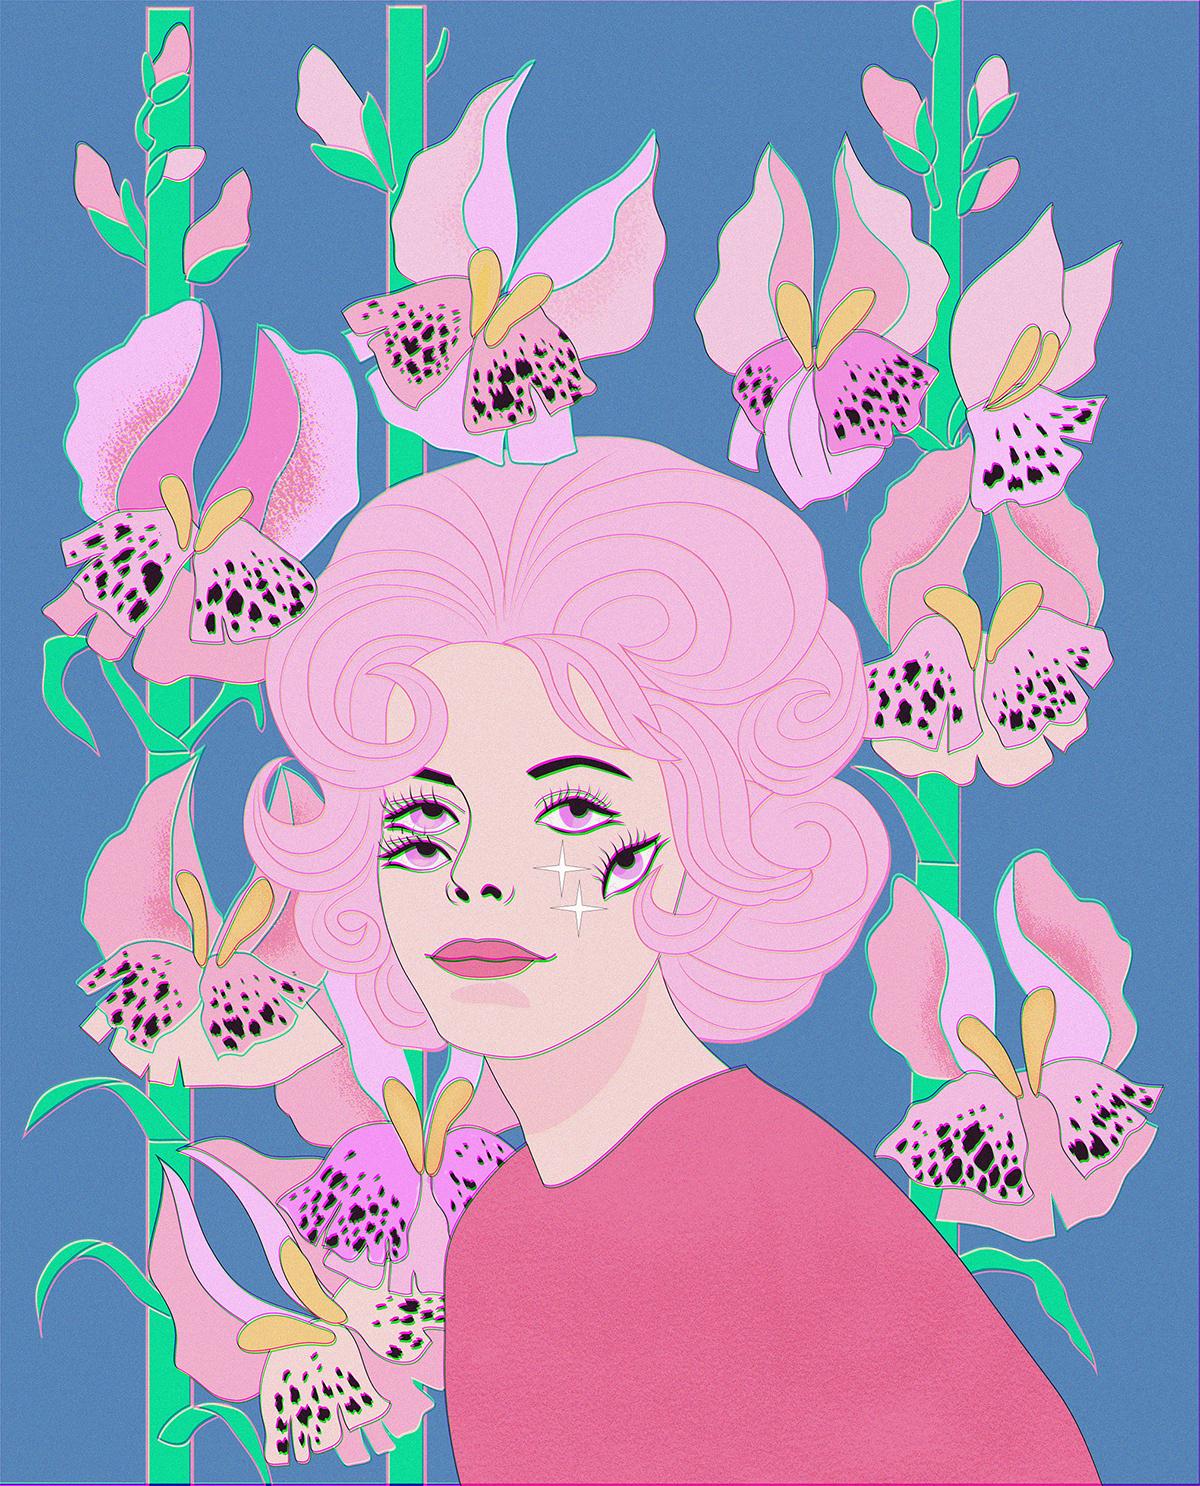 Illustrator japanese octopus portrait srrealism Vector Illustration